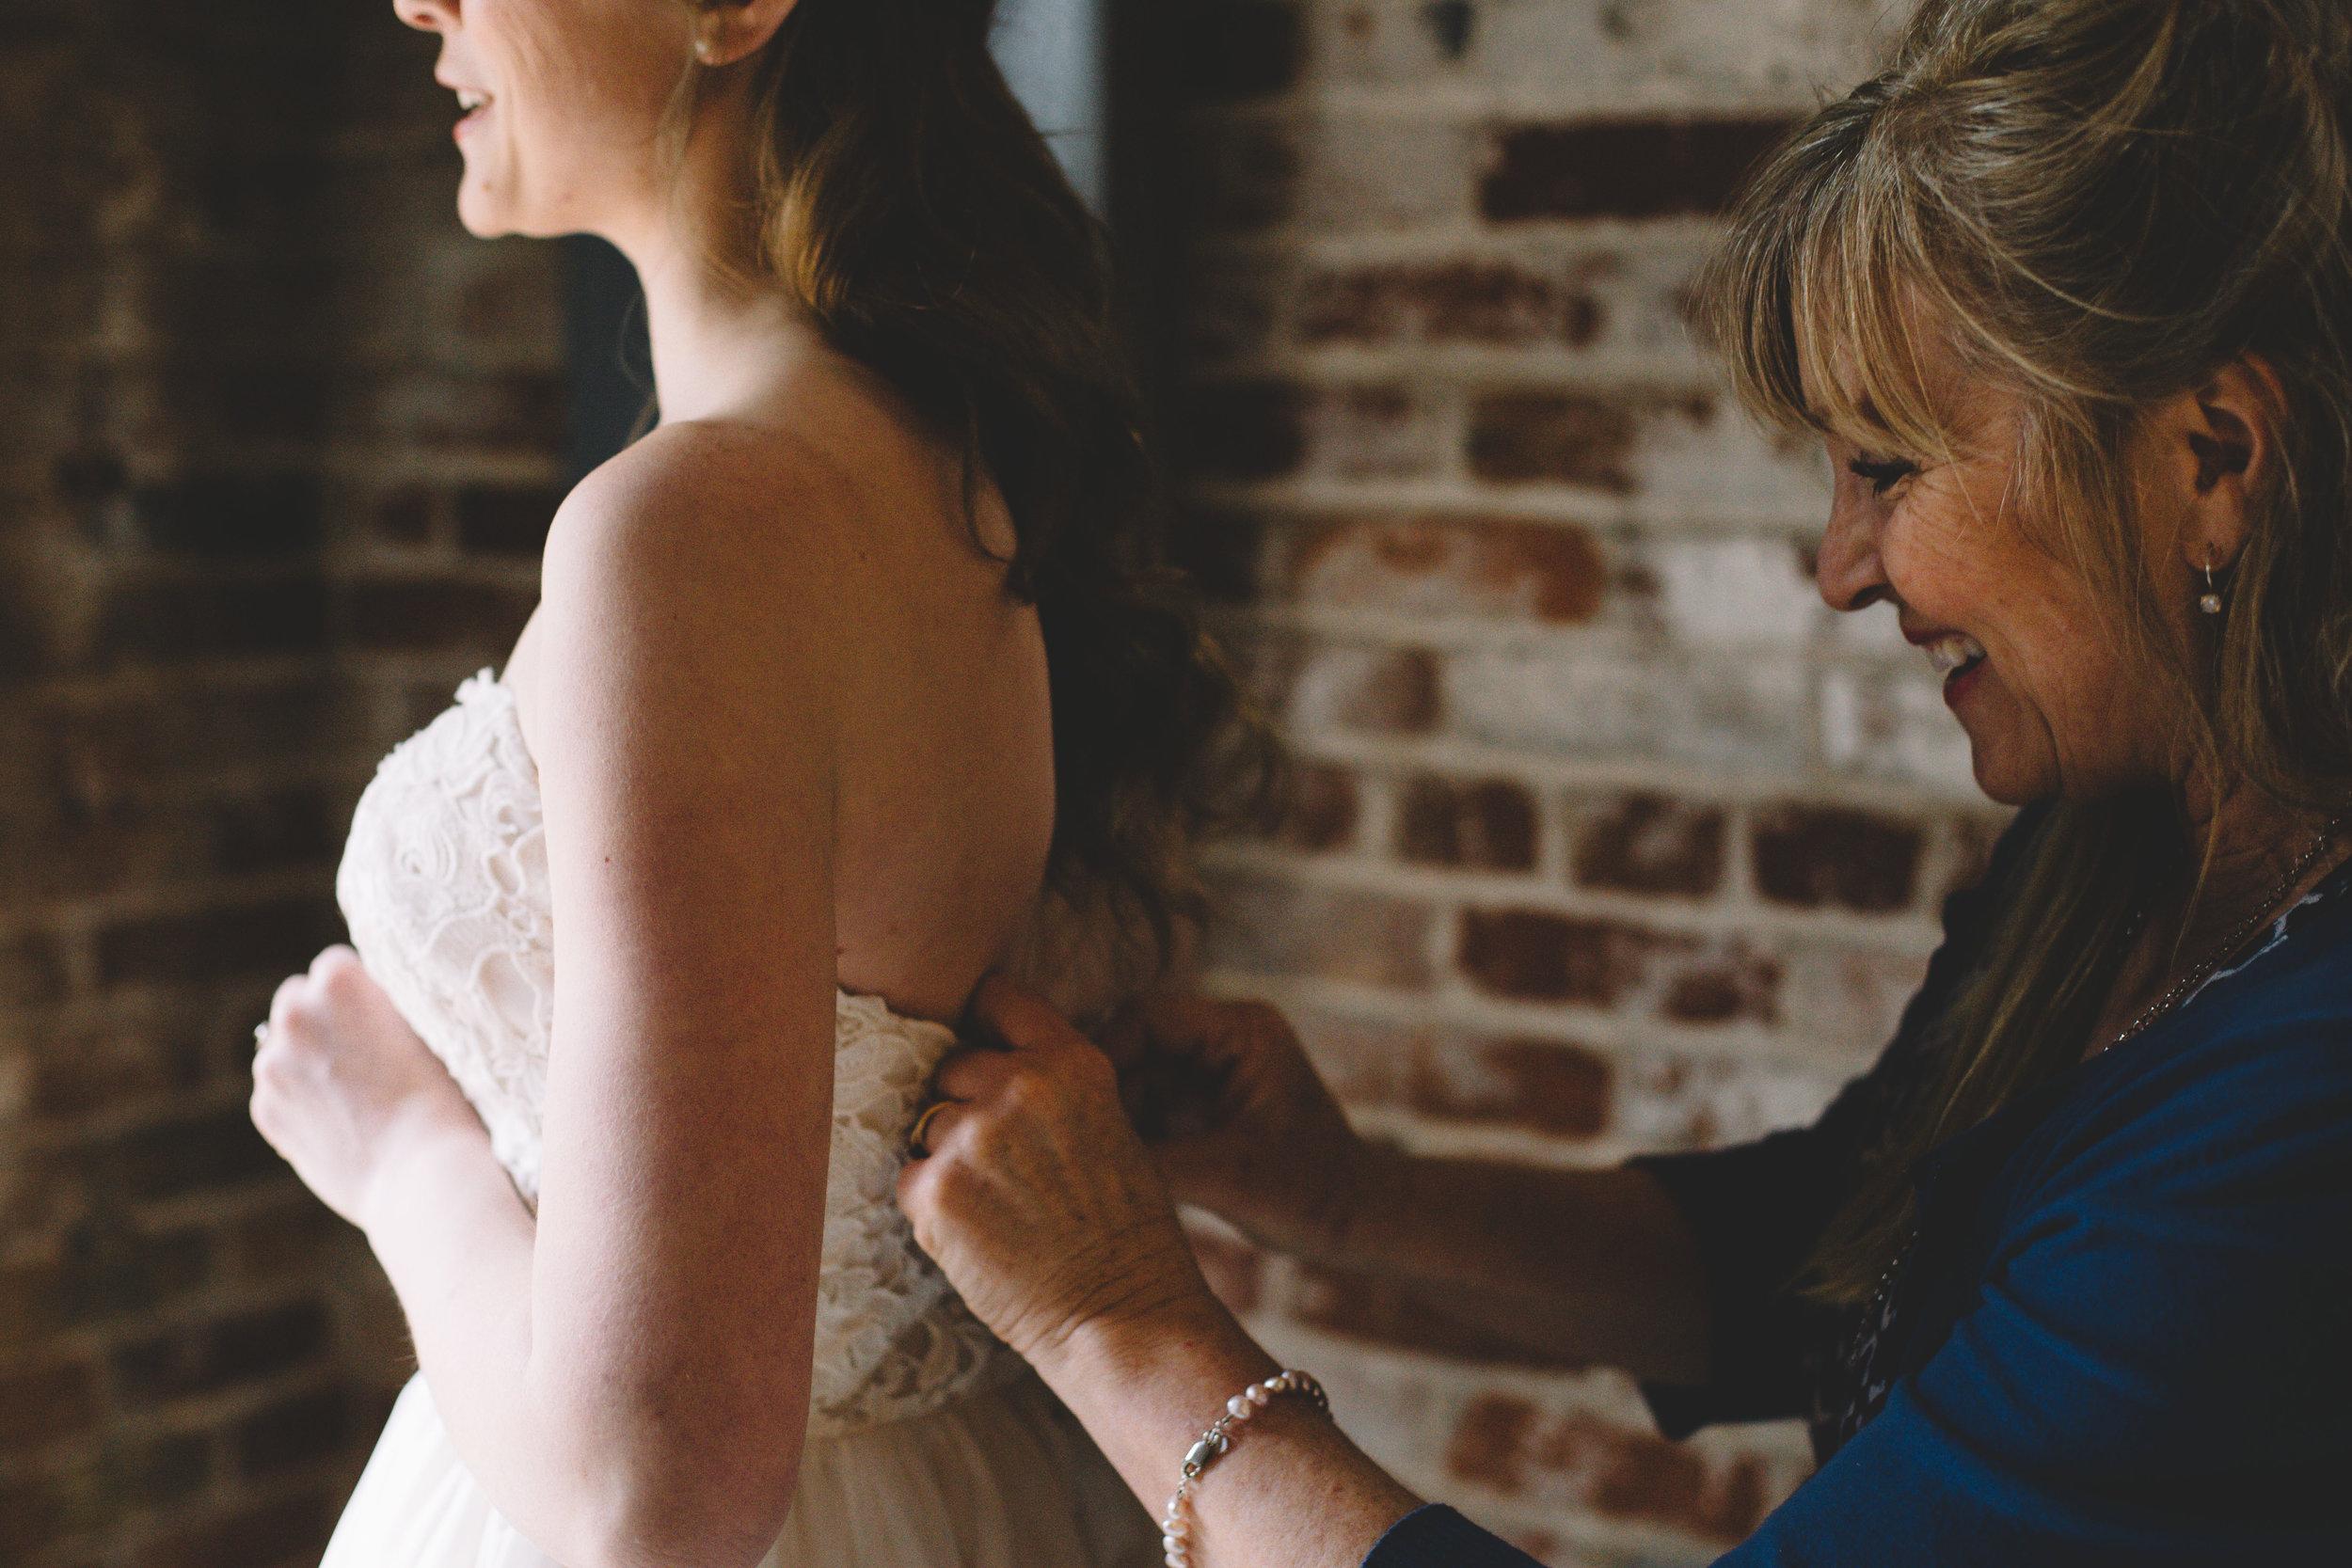 Jake + Brittney Balbas Airbnb Carriage House Wedding Evansville IN (39 of 426).jpg